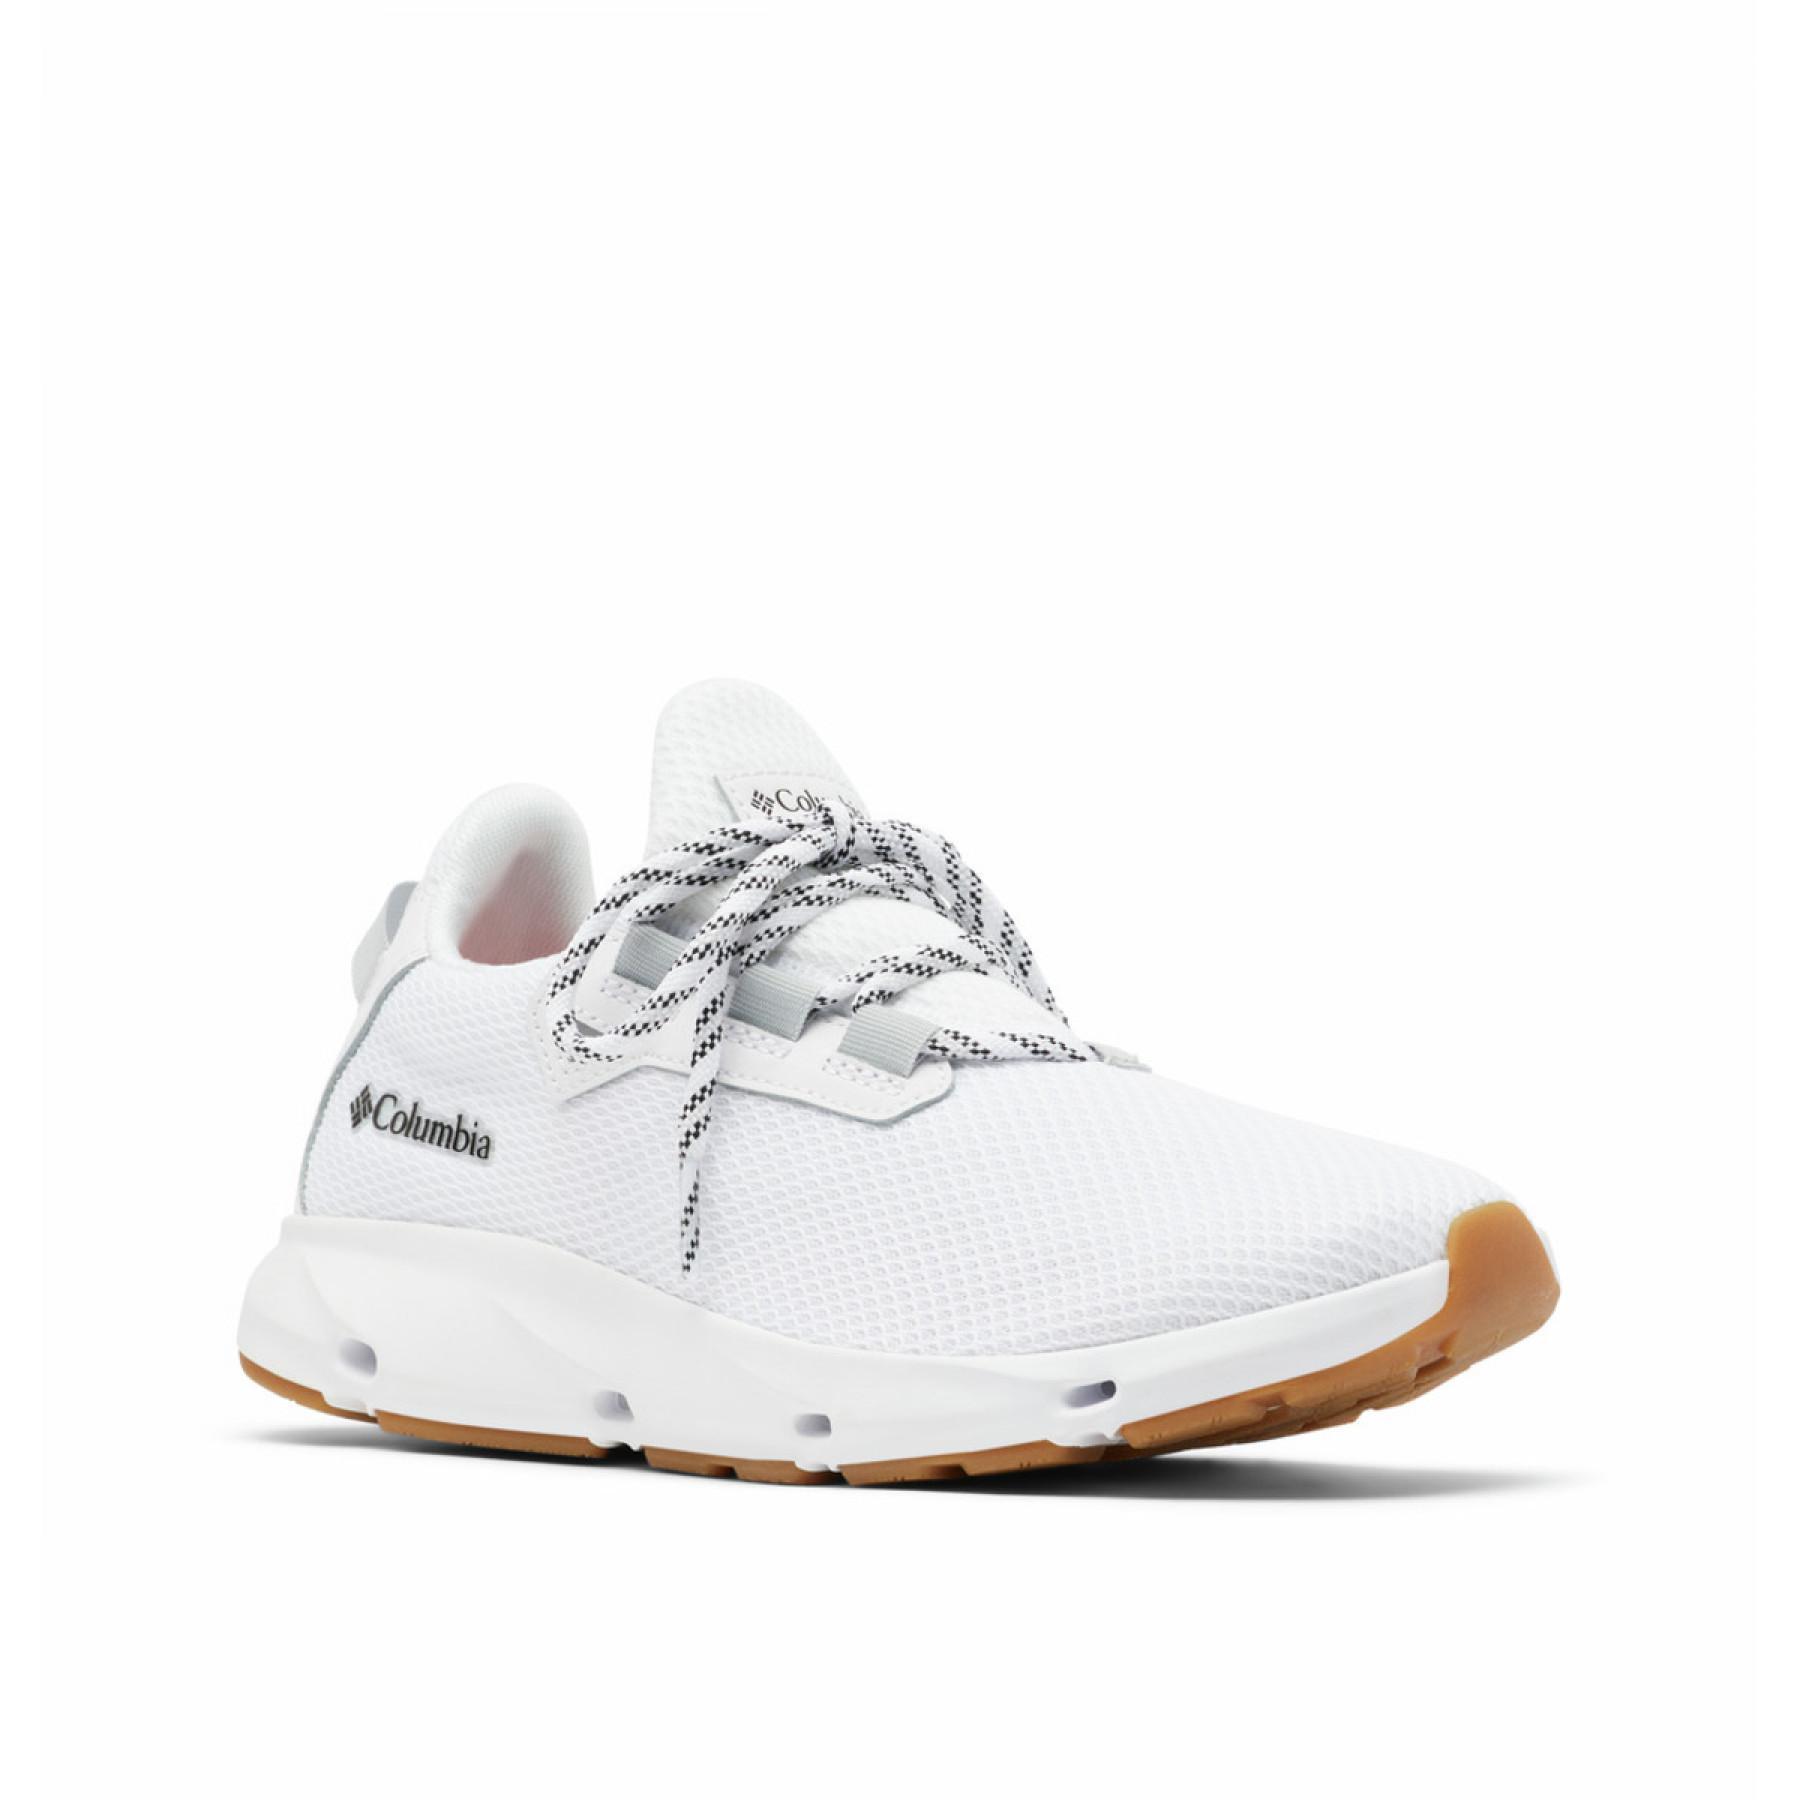 Columbia VENT AERO Women's Shoes